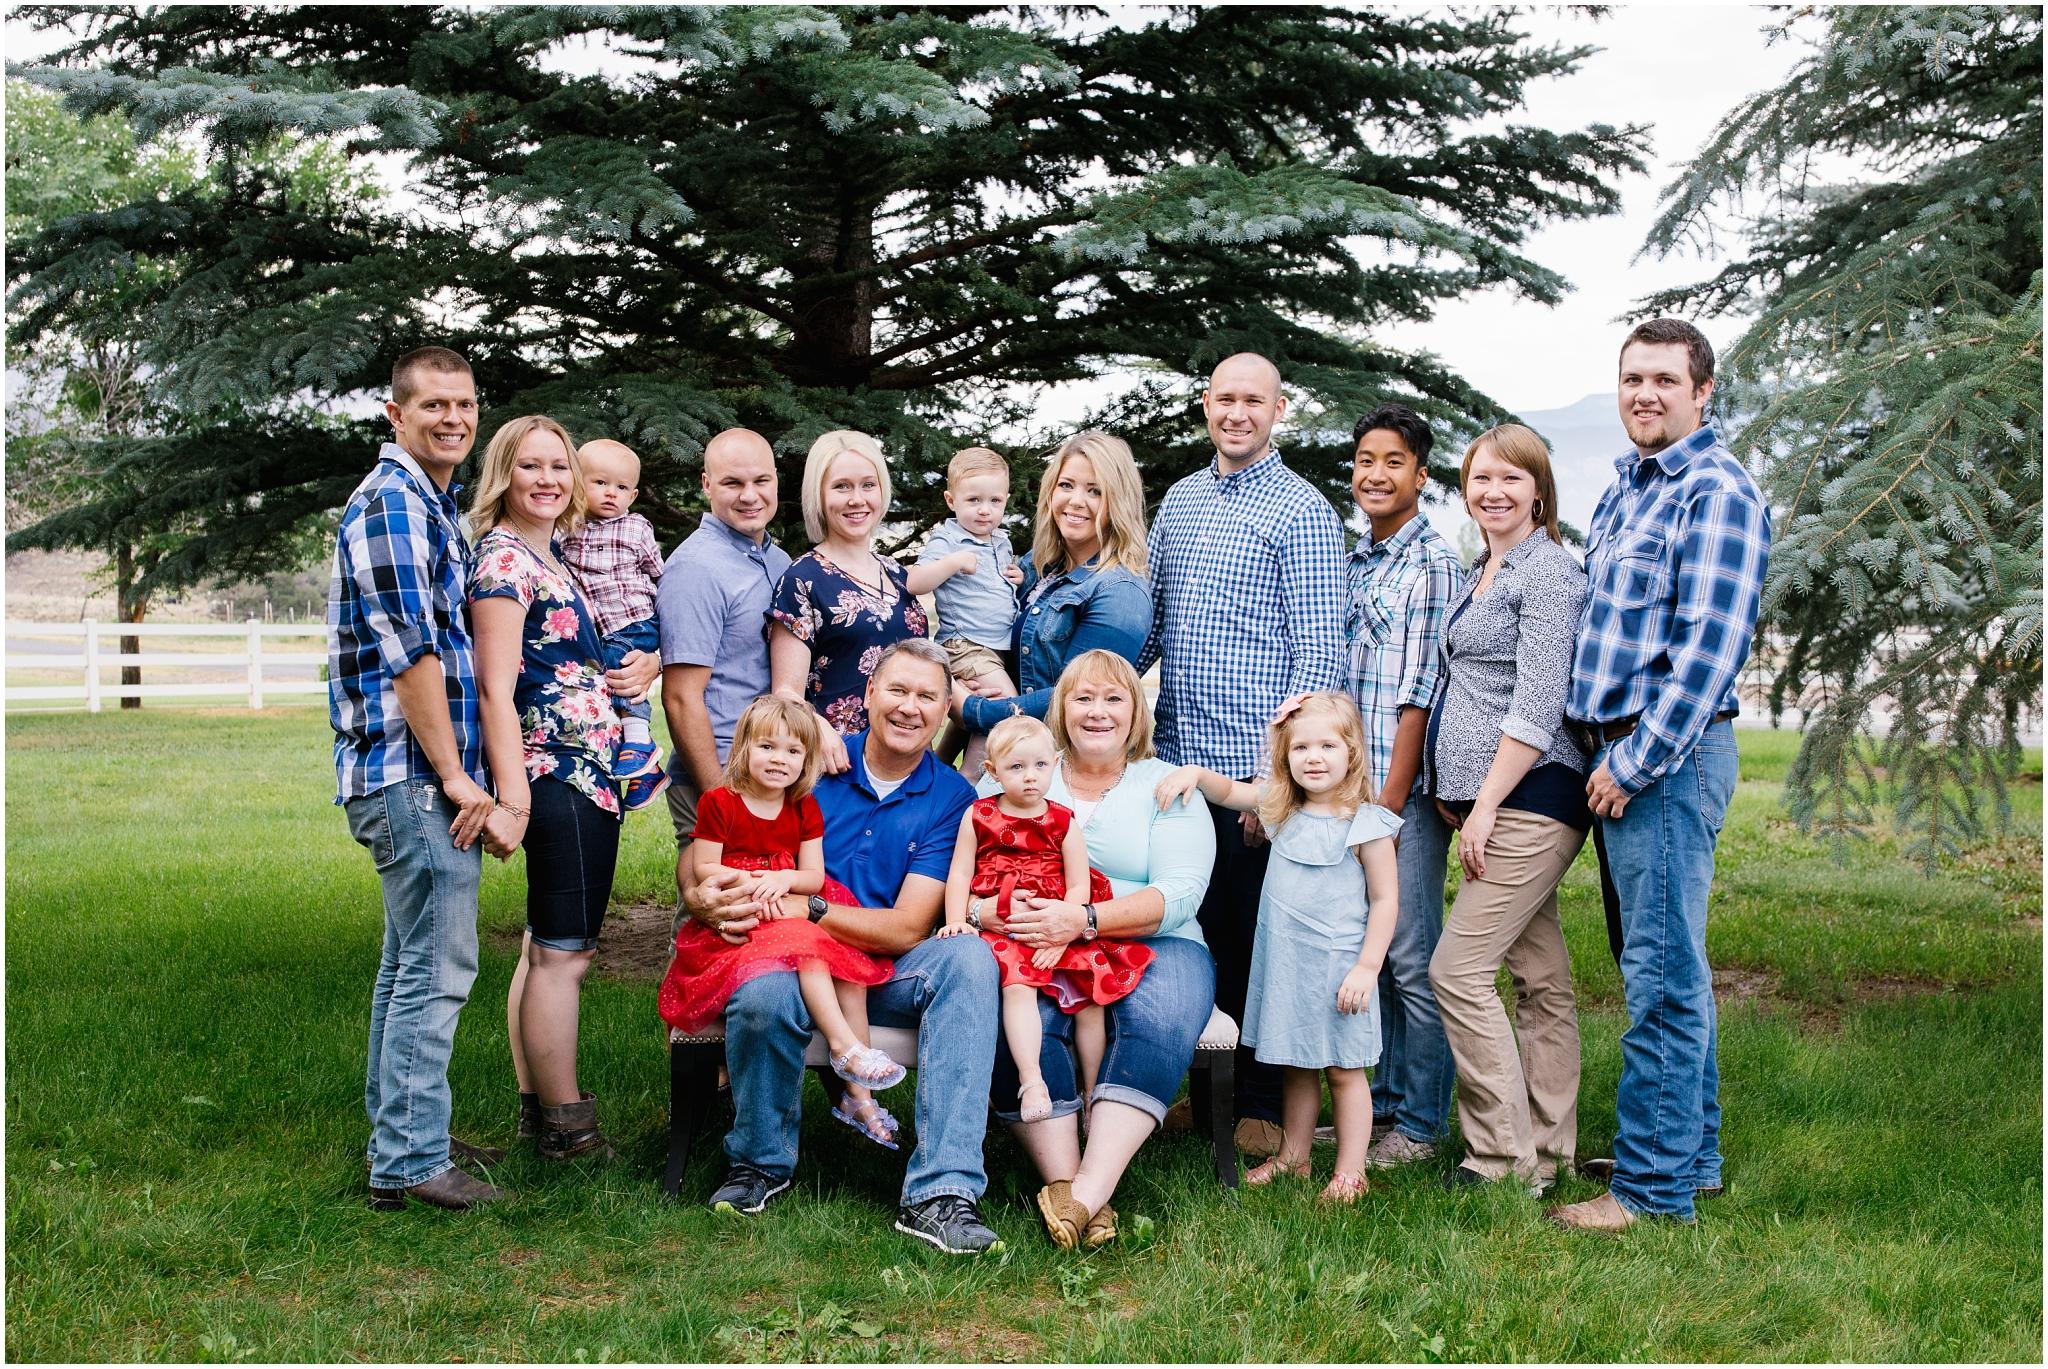 Brinkerhoff-6_Lizzie-B-Imagery-Utah-Family-Photographer-Central-Utah-Photographer-Utah-County-Extended-Family-Session.jpg